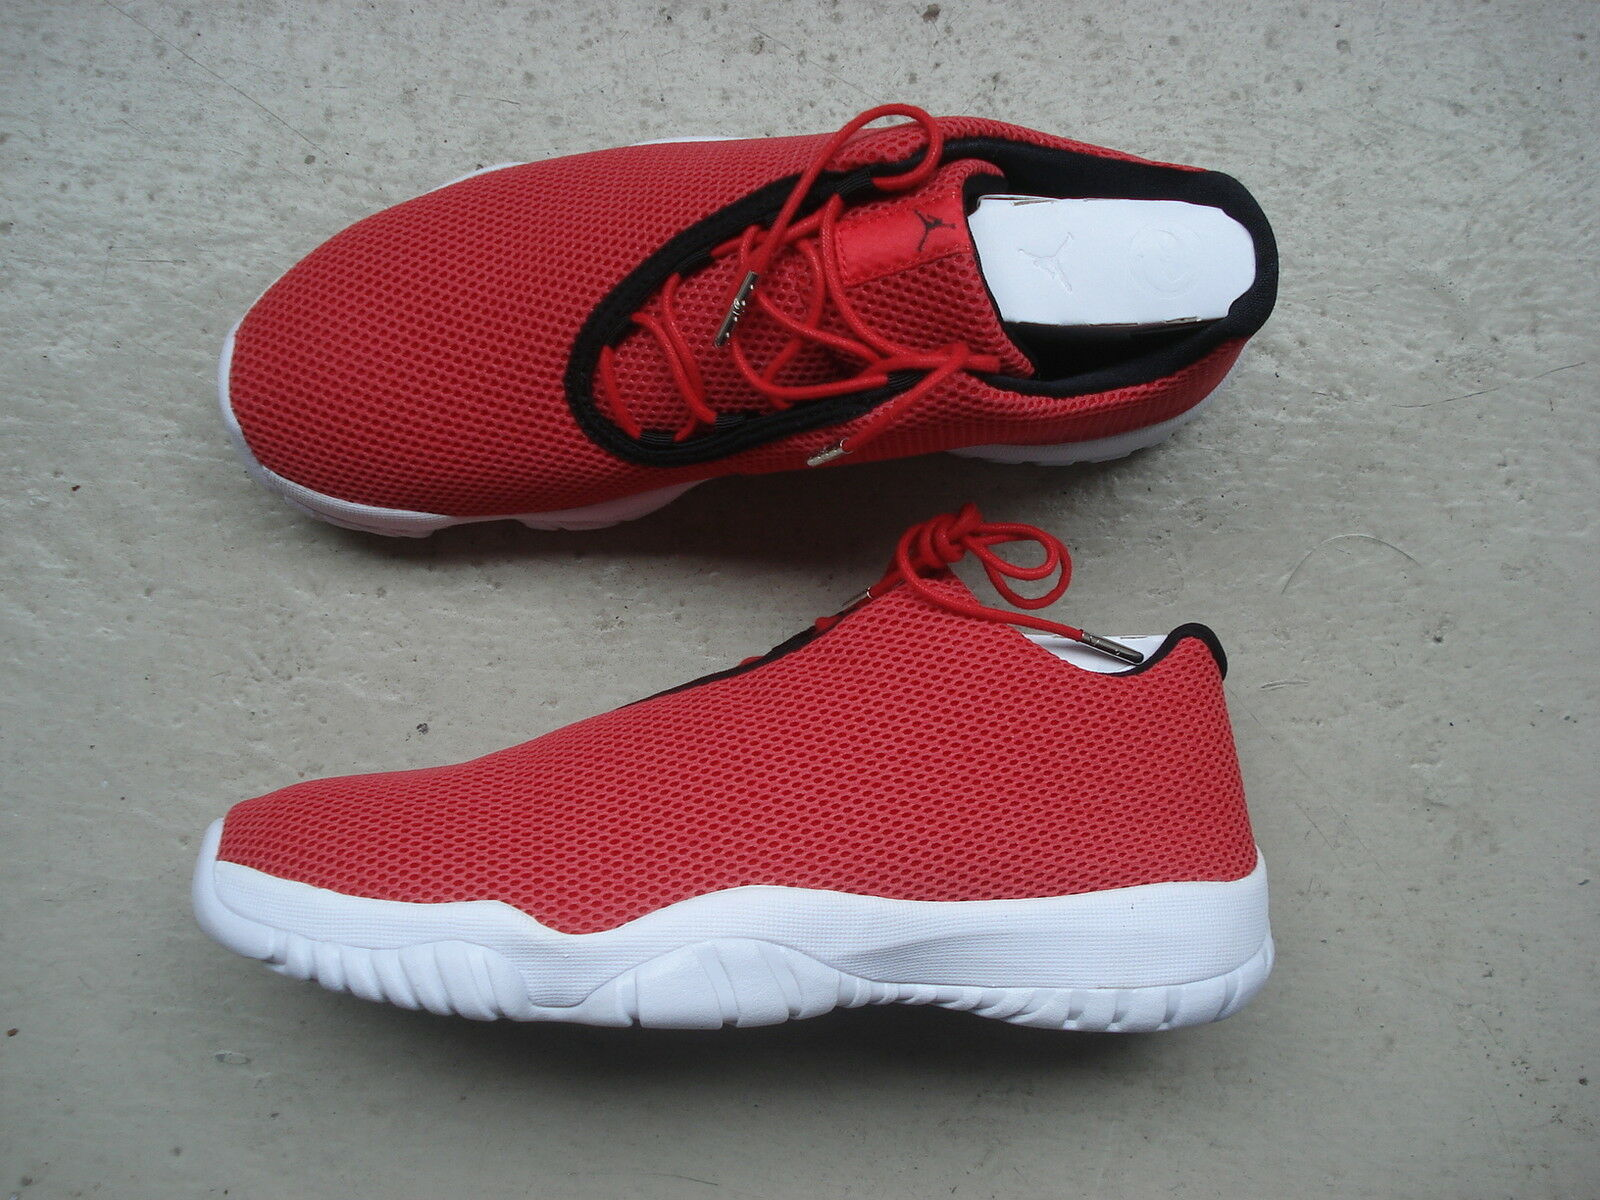 Nike Air Jordan Future Red/NegroBlanco low 45 reflective University Red/NegroBlanco Future 1e1cfc